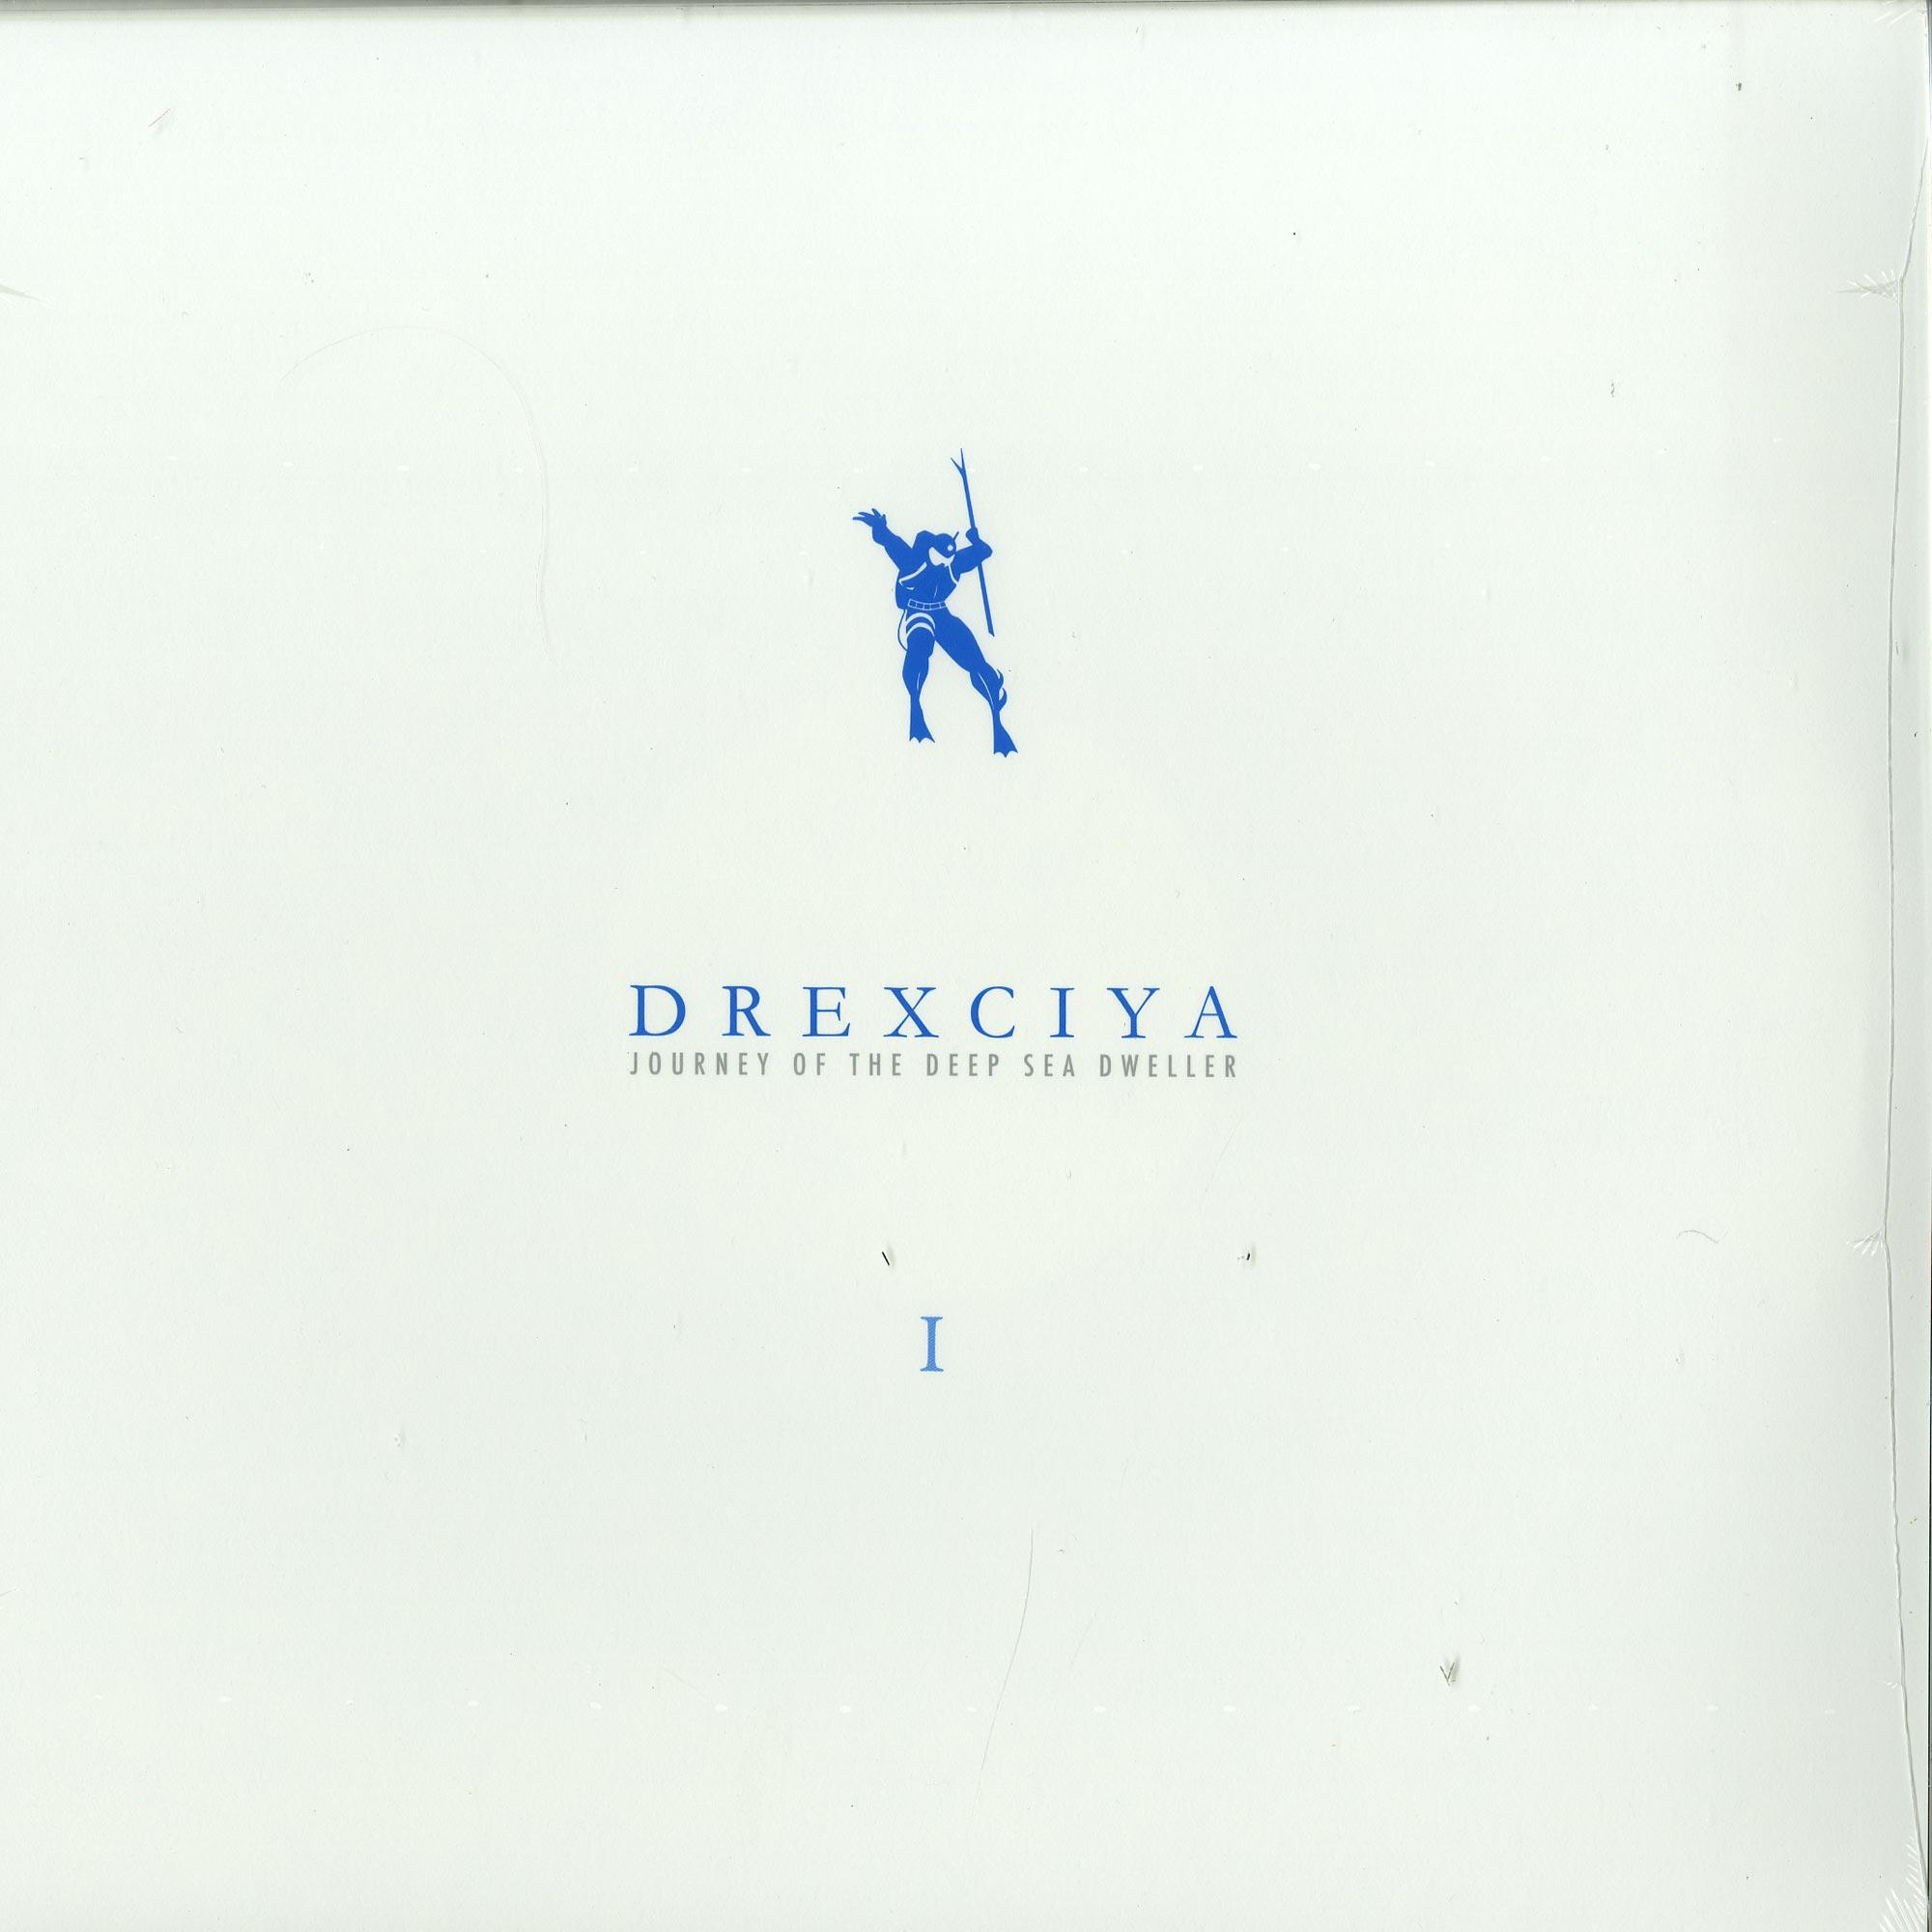 Drexciya - JOURNEY OF THE DEEP SEA DWELLER